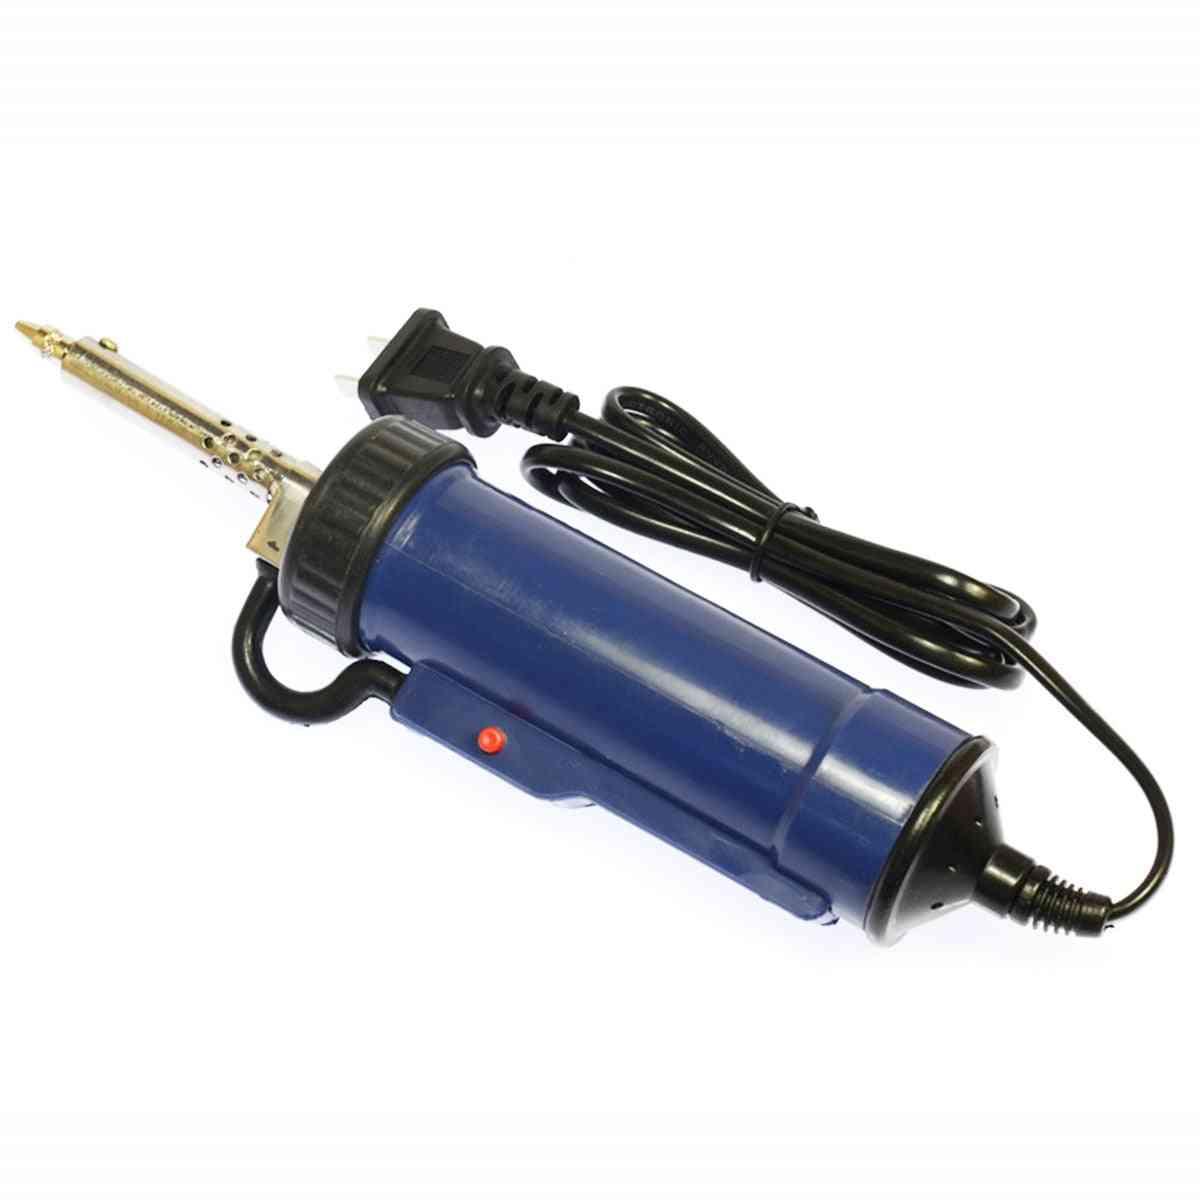 Solder Sucker 30w Electric Vacuum Desoldering Pump Iron Gun